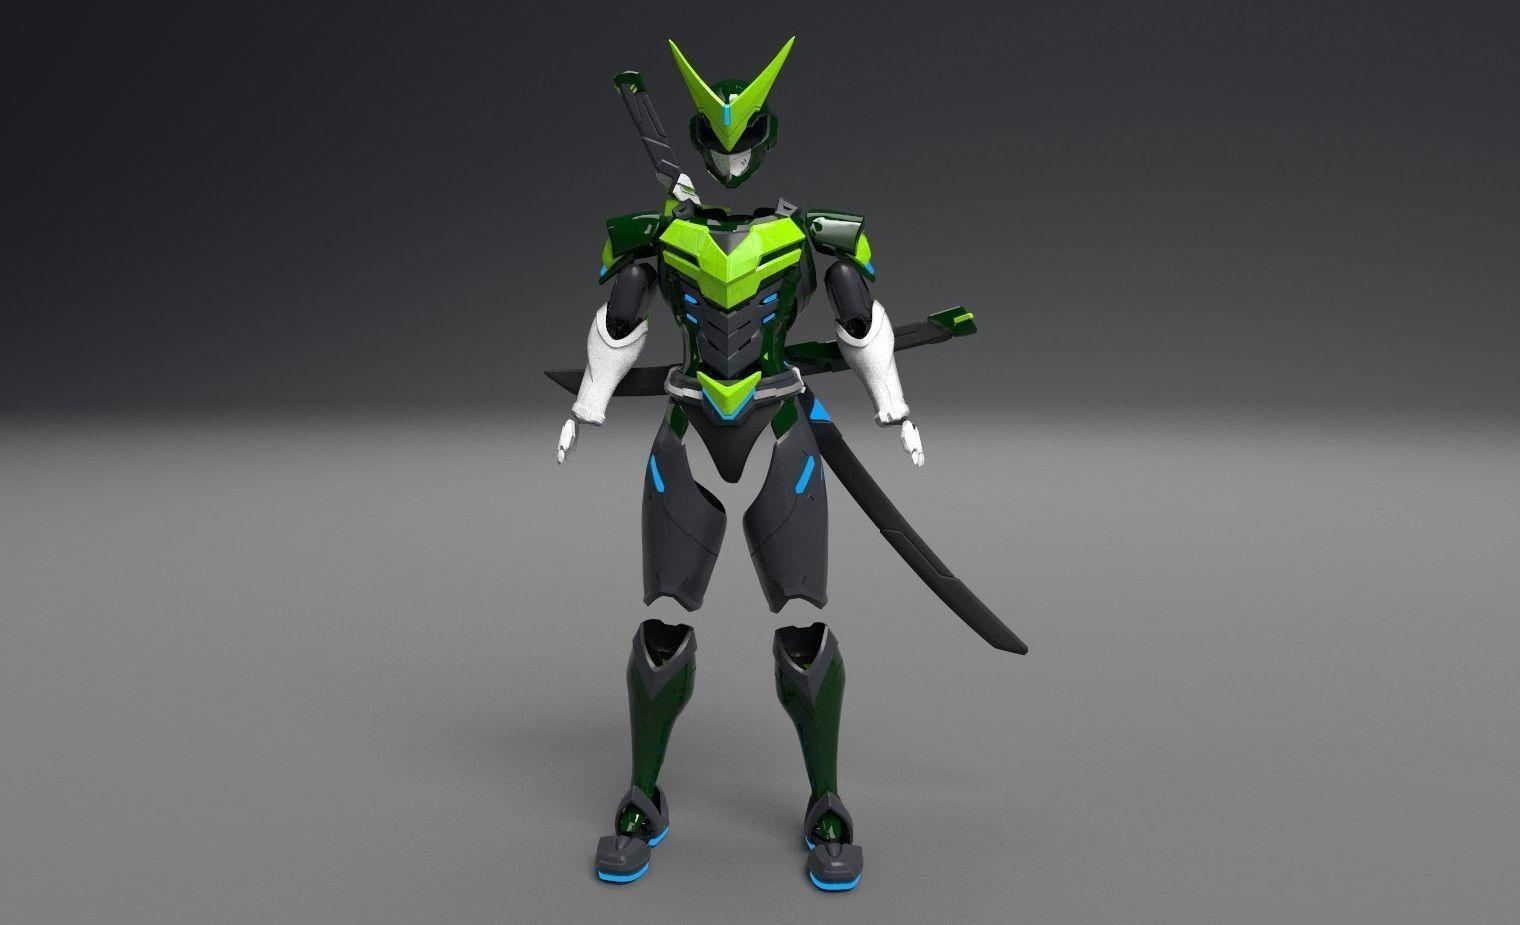 Genji Sentai full armor